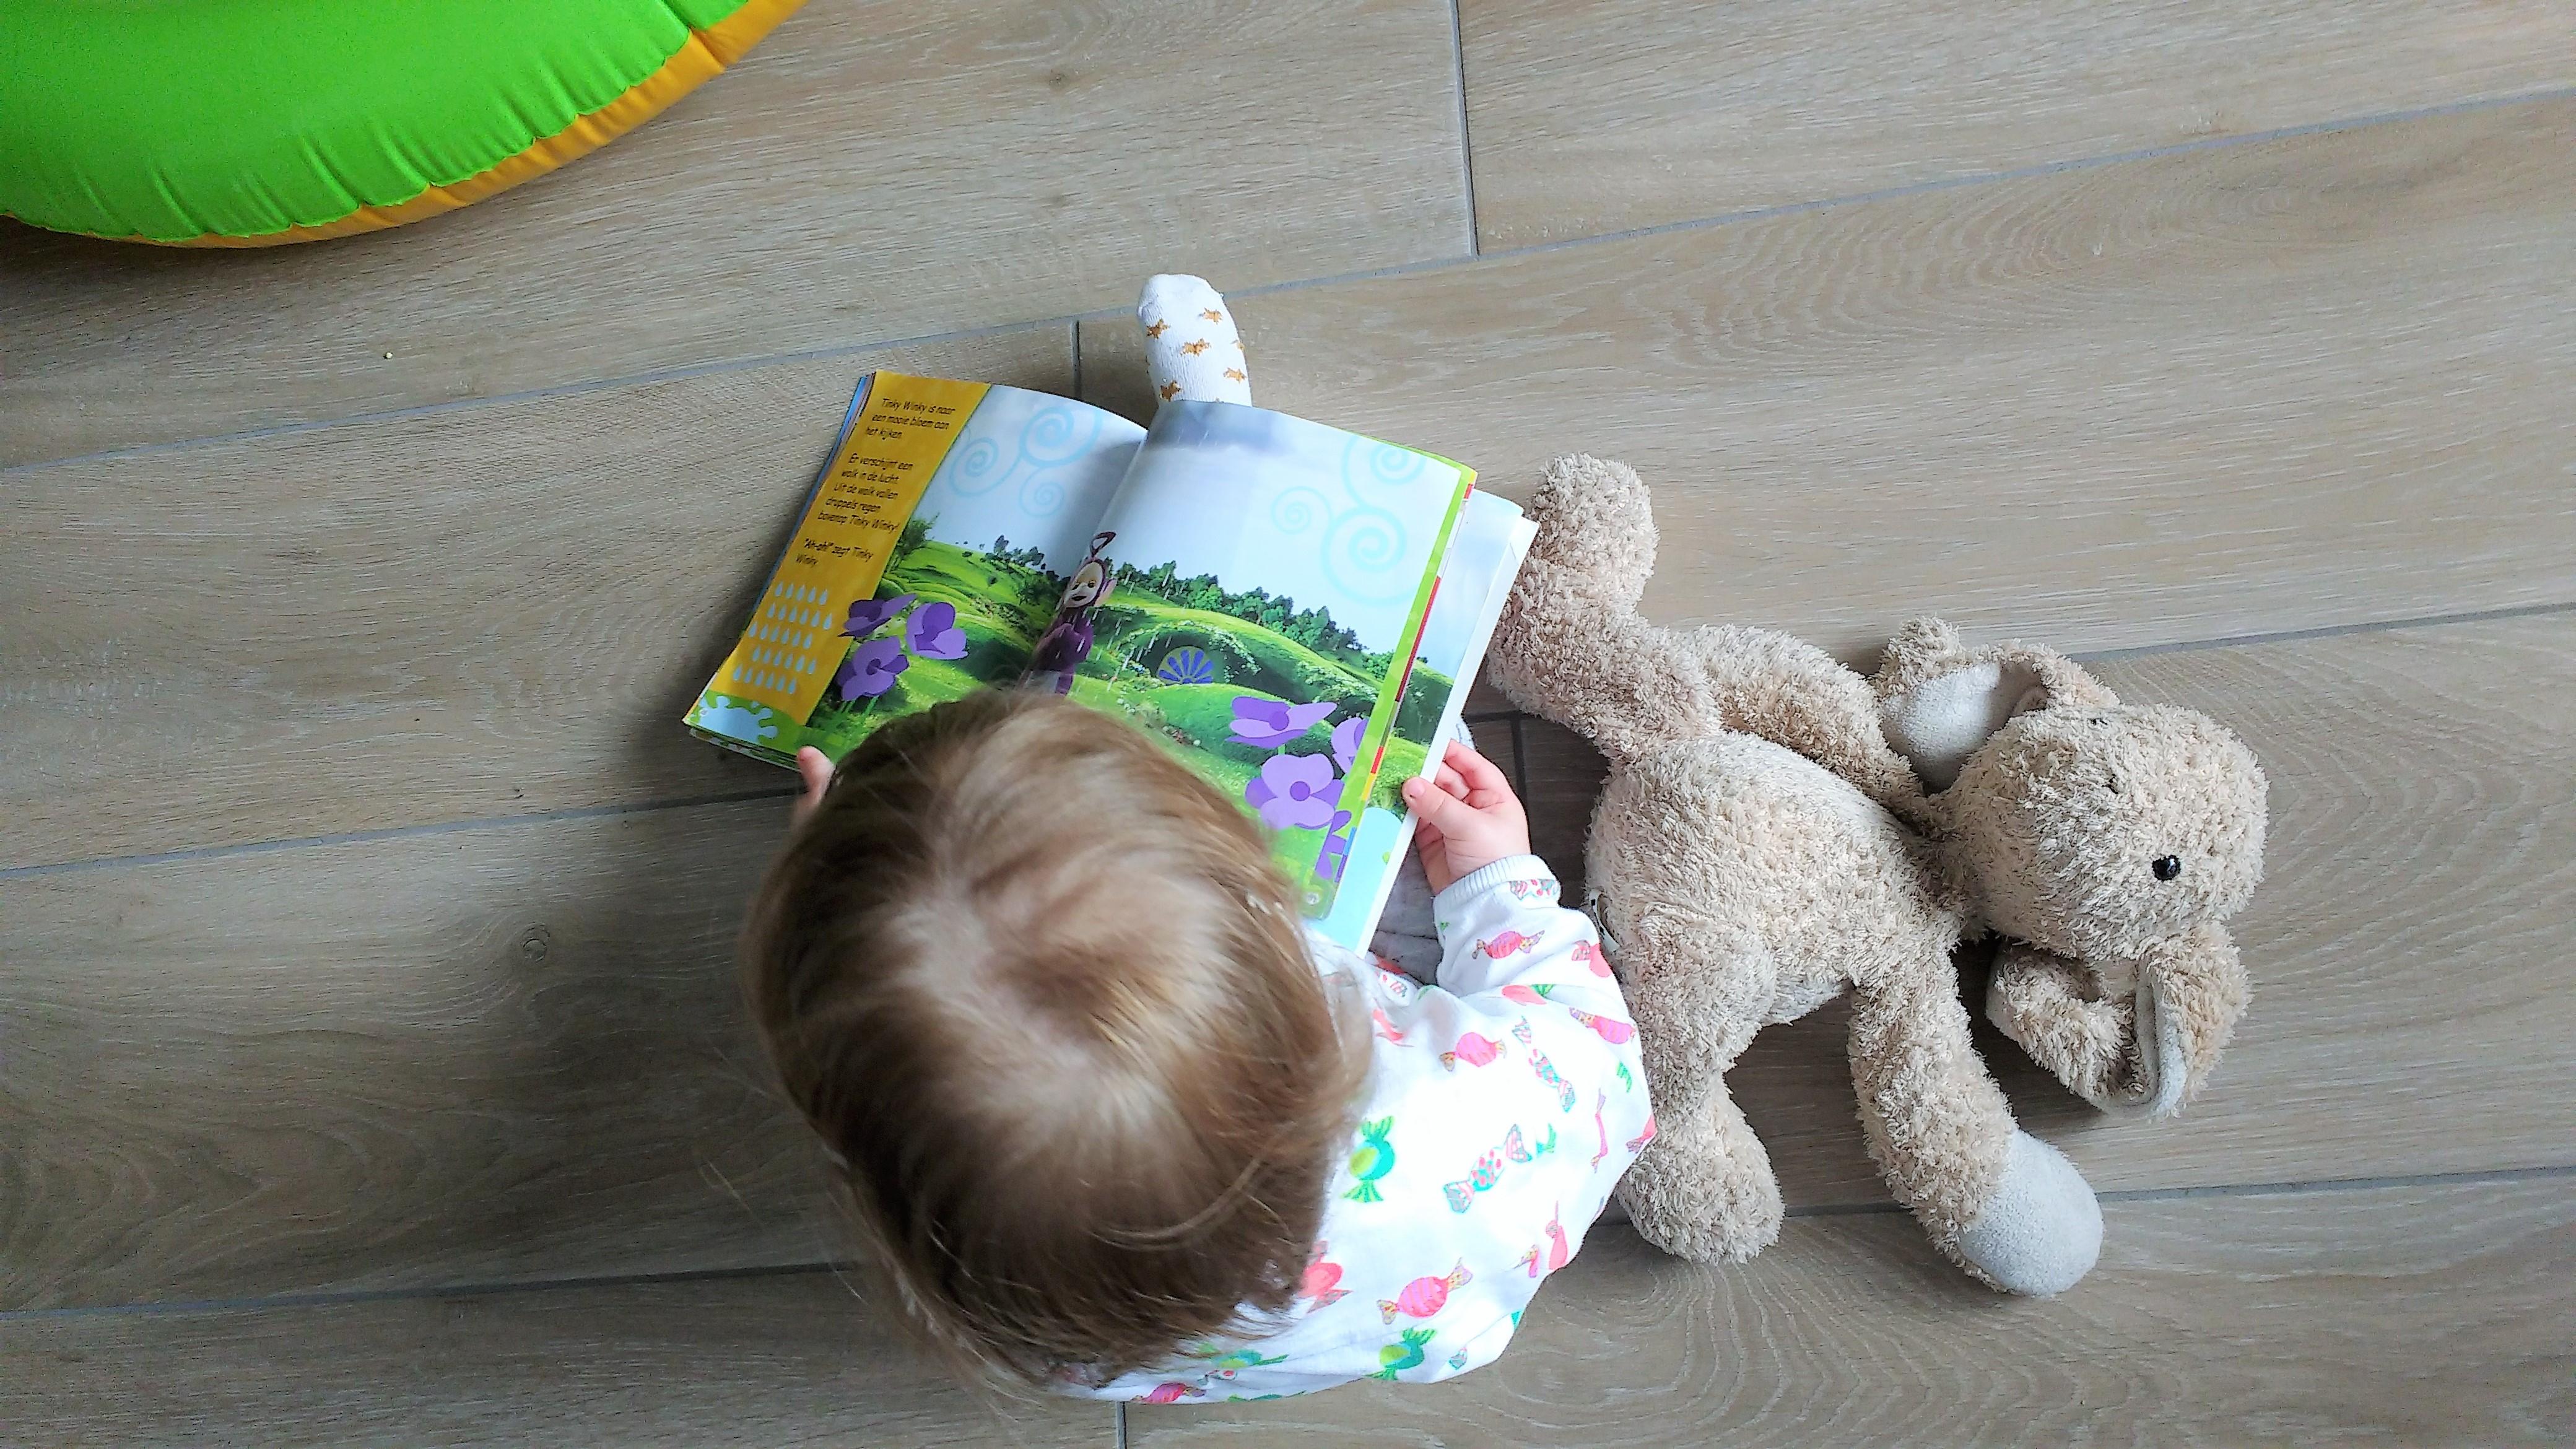 boekjes, boeken, voorlezen, boekjes lezen, dreumes, peuter, waarom voorlezen, kinderen, kinderboeken, kind, mamablog, mamablogger, lalog, lalogblog, lalog.nl